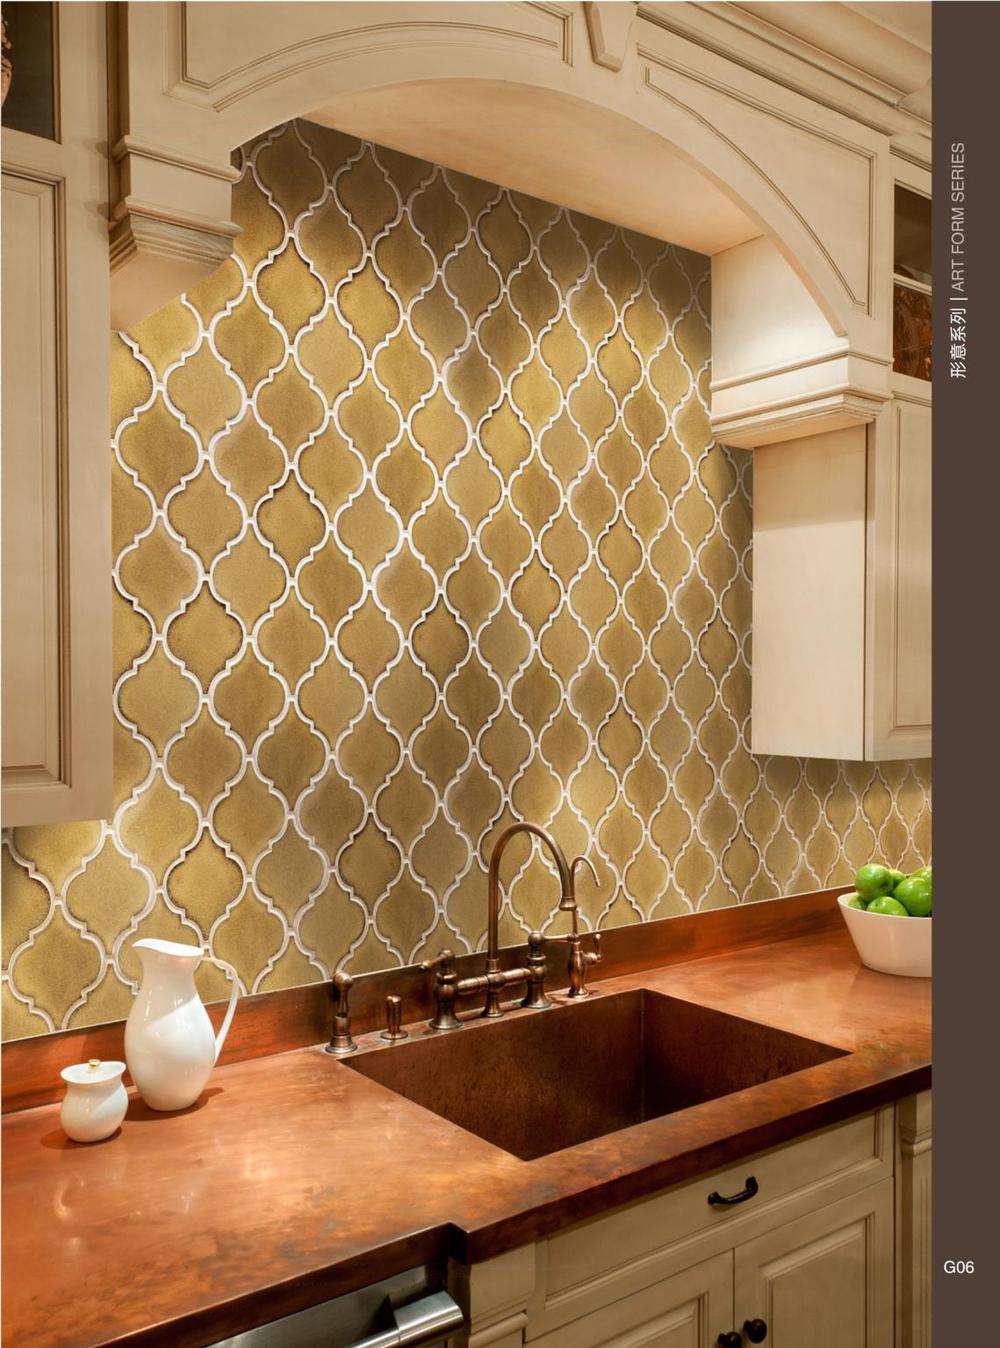 Exterior Wall Mosaic Bathroom Cheap Luxury Gold Swimming Pool Ceramic Swimming Pool Tile Mosaic